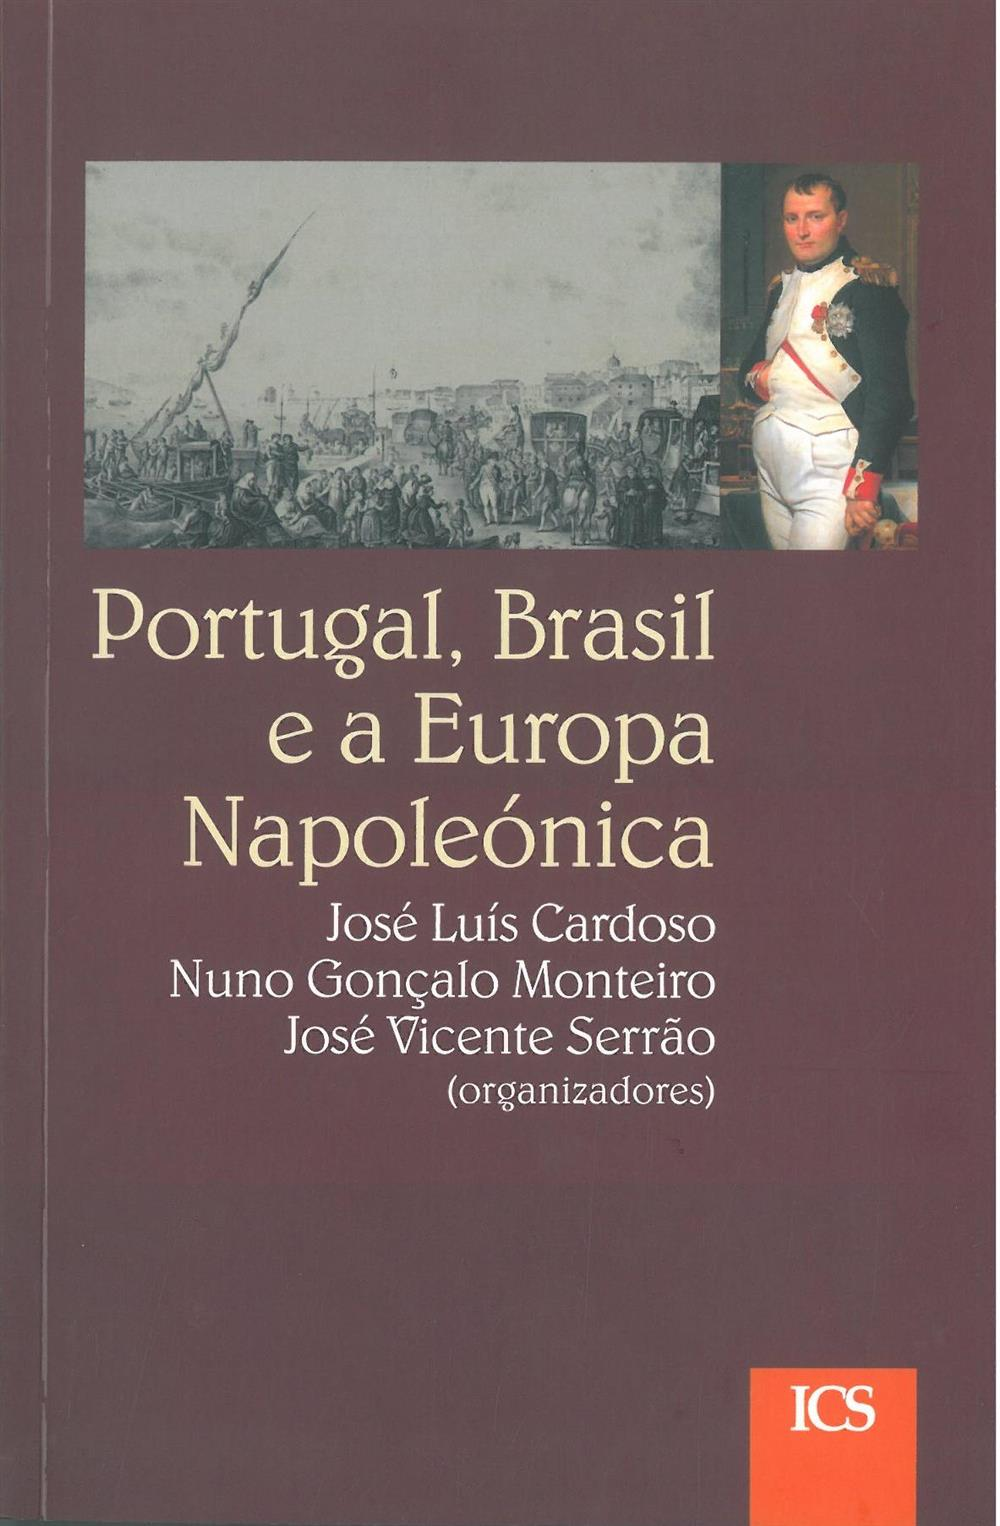 Portugal, Brasil e a Europa Napoleónica.jpg